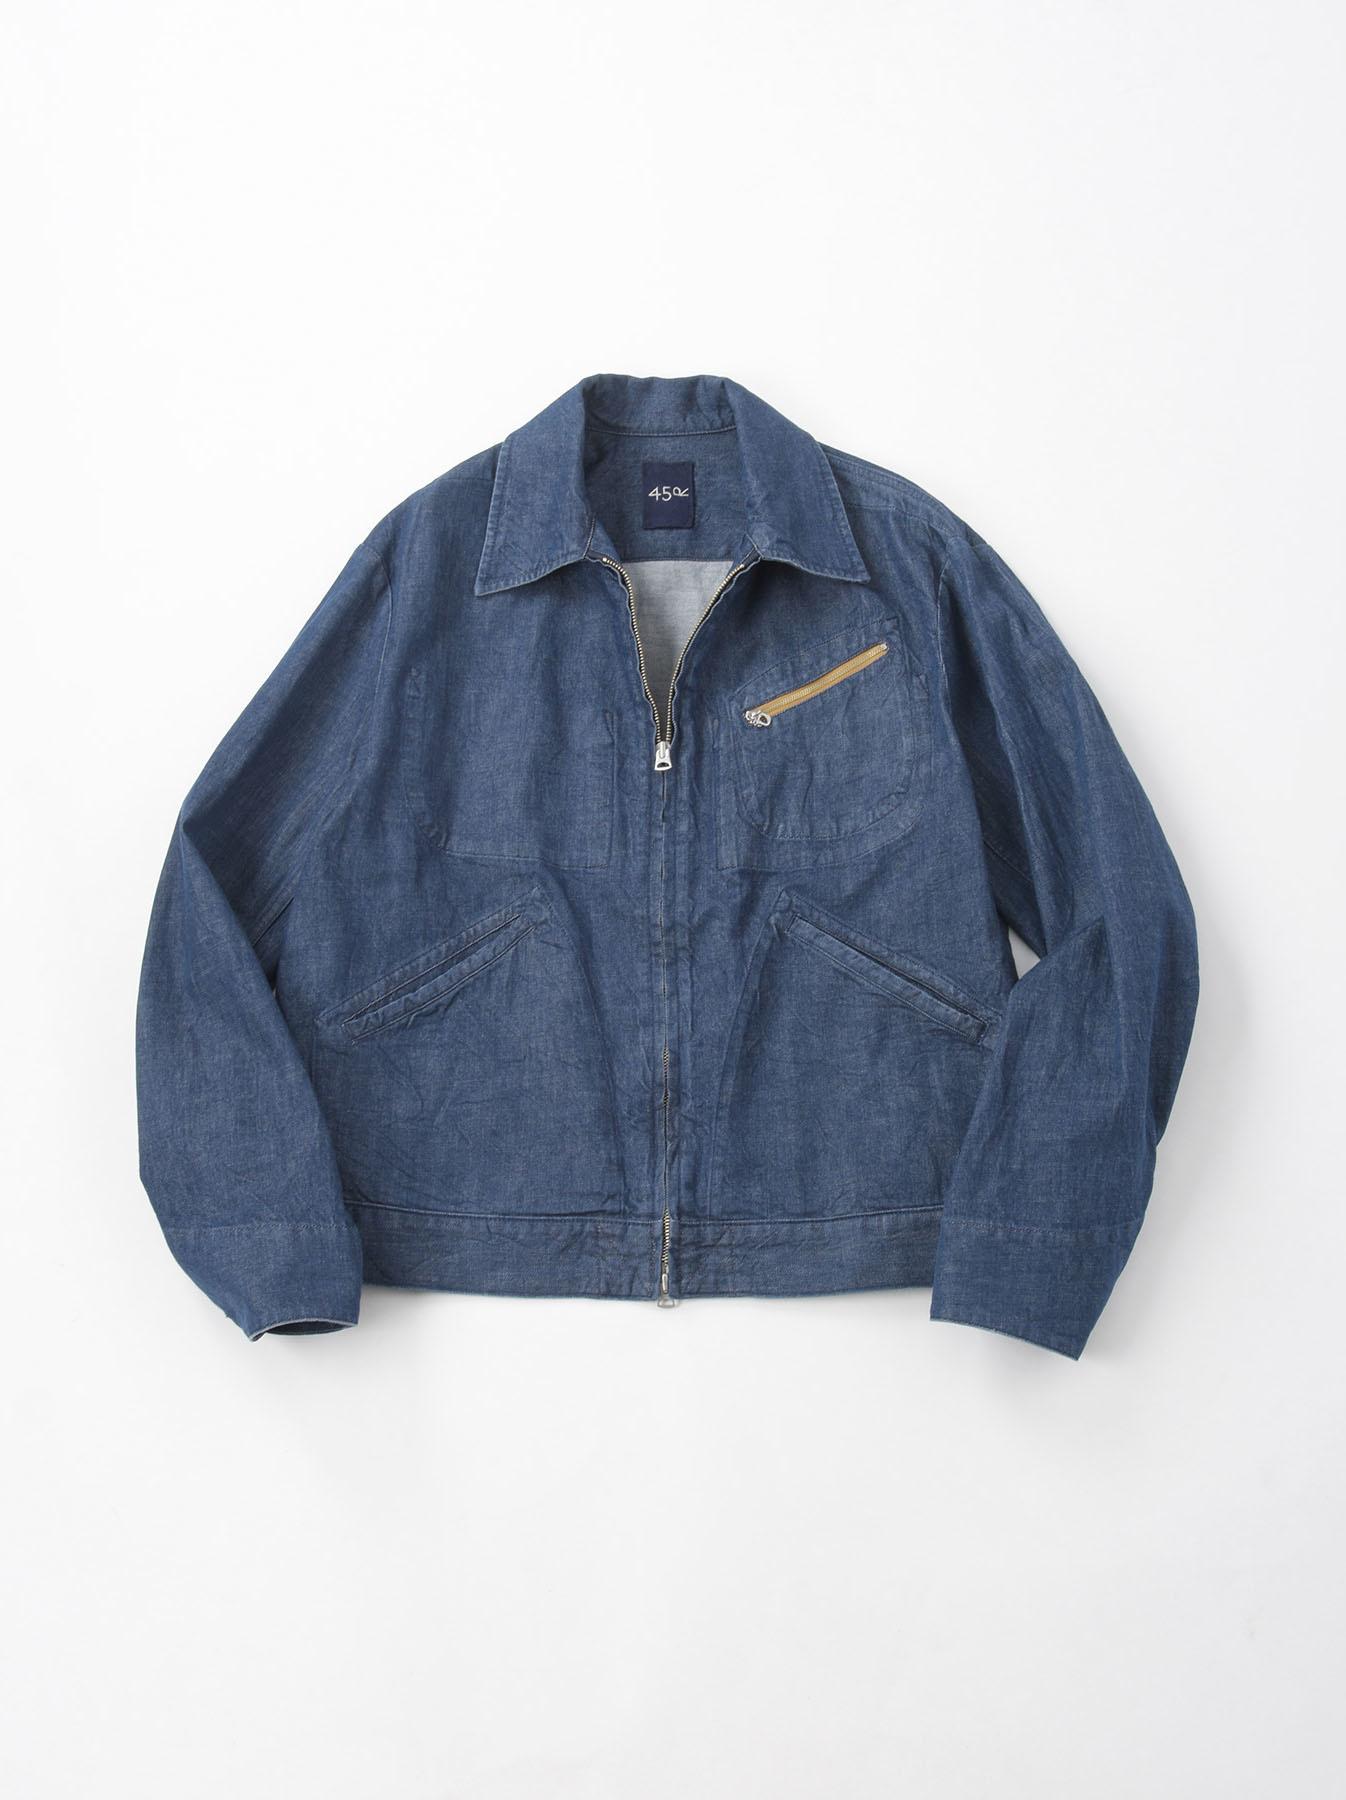 Distressed Mugi Denim Jacket-1